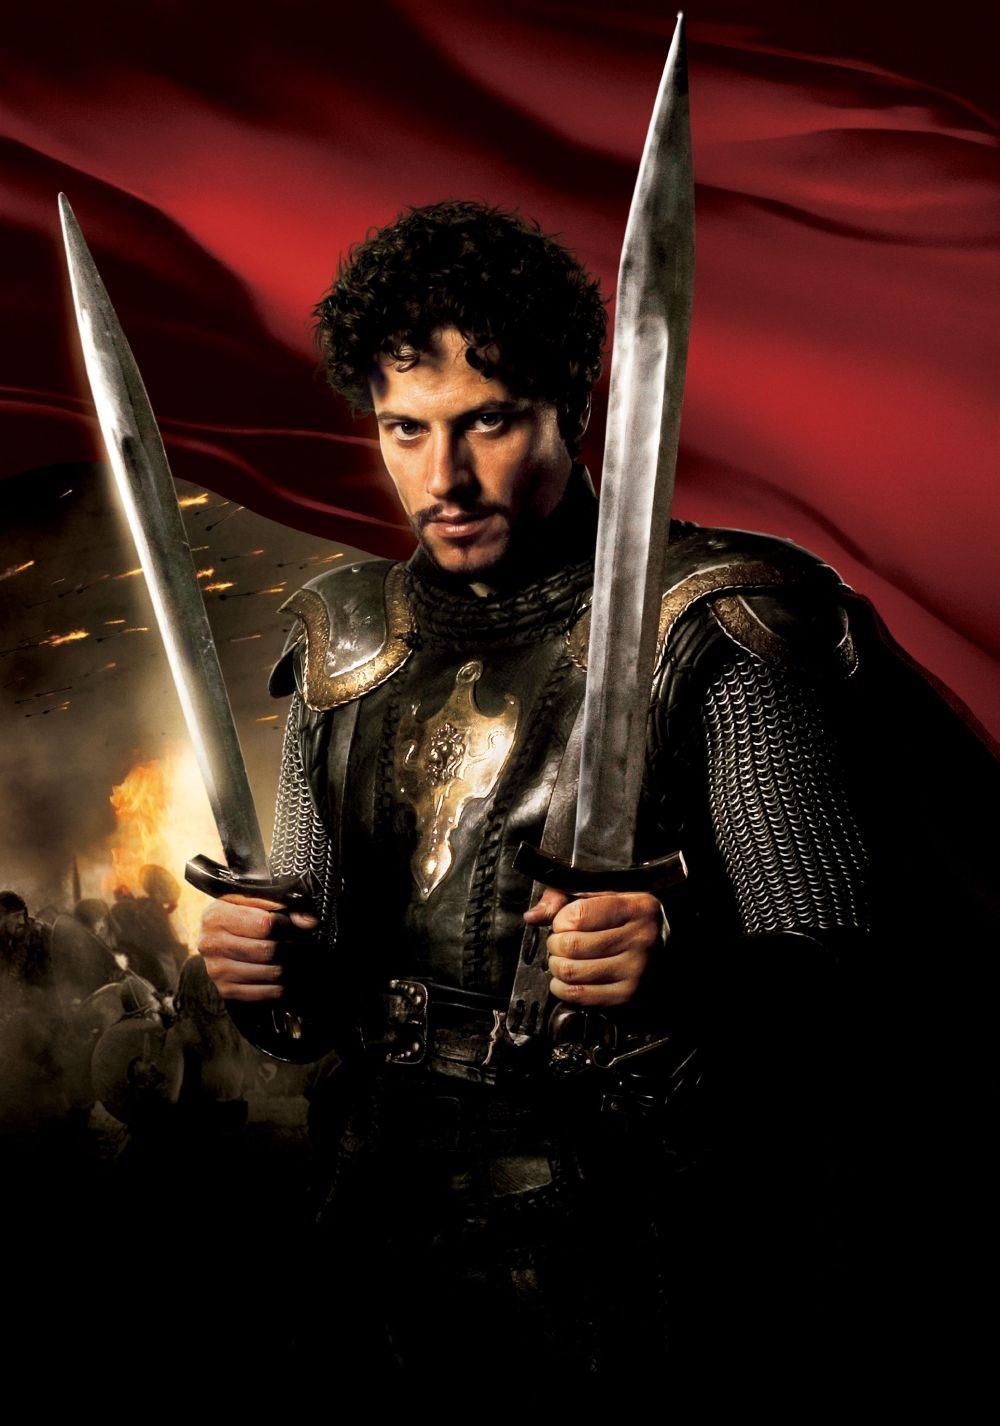 King Arthur (Film)